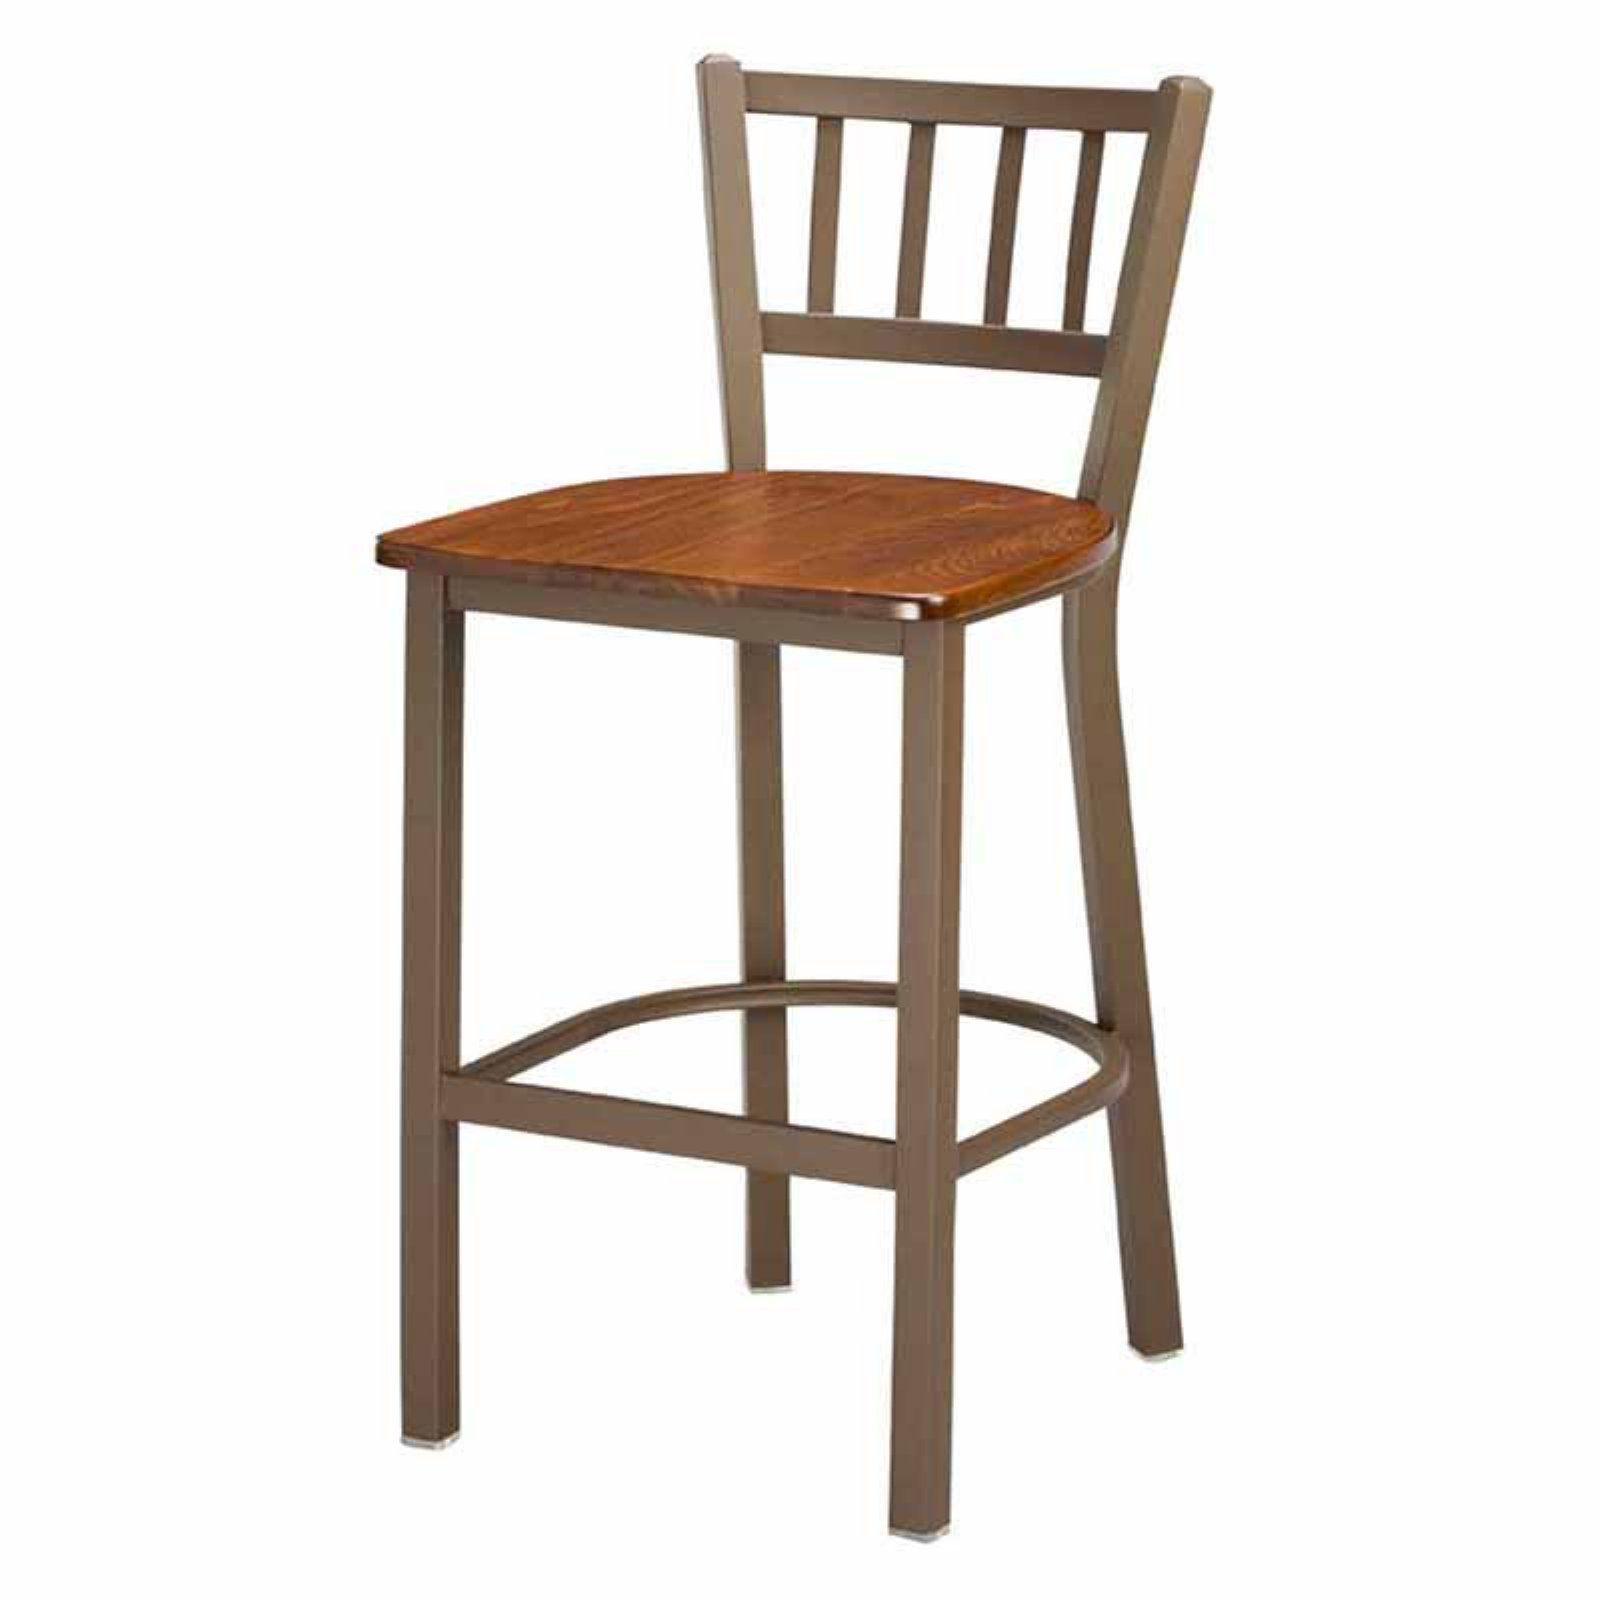 Brilliant Regal Jailhouse 26 In Metal Counter Stool With Wood Seat Creativecarmelina Interior Chair Design Creativecarmelinacom